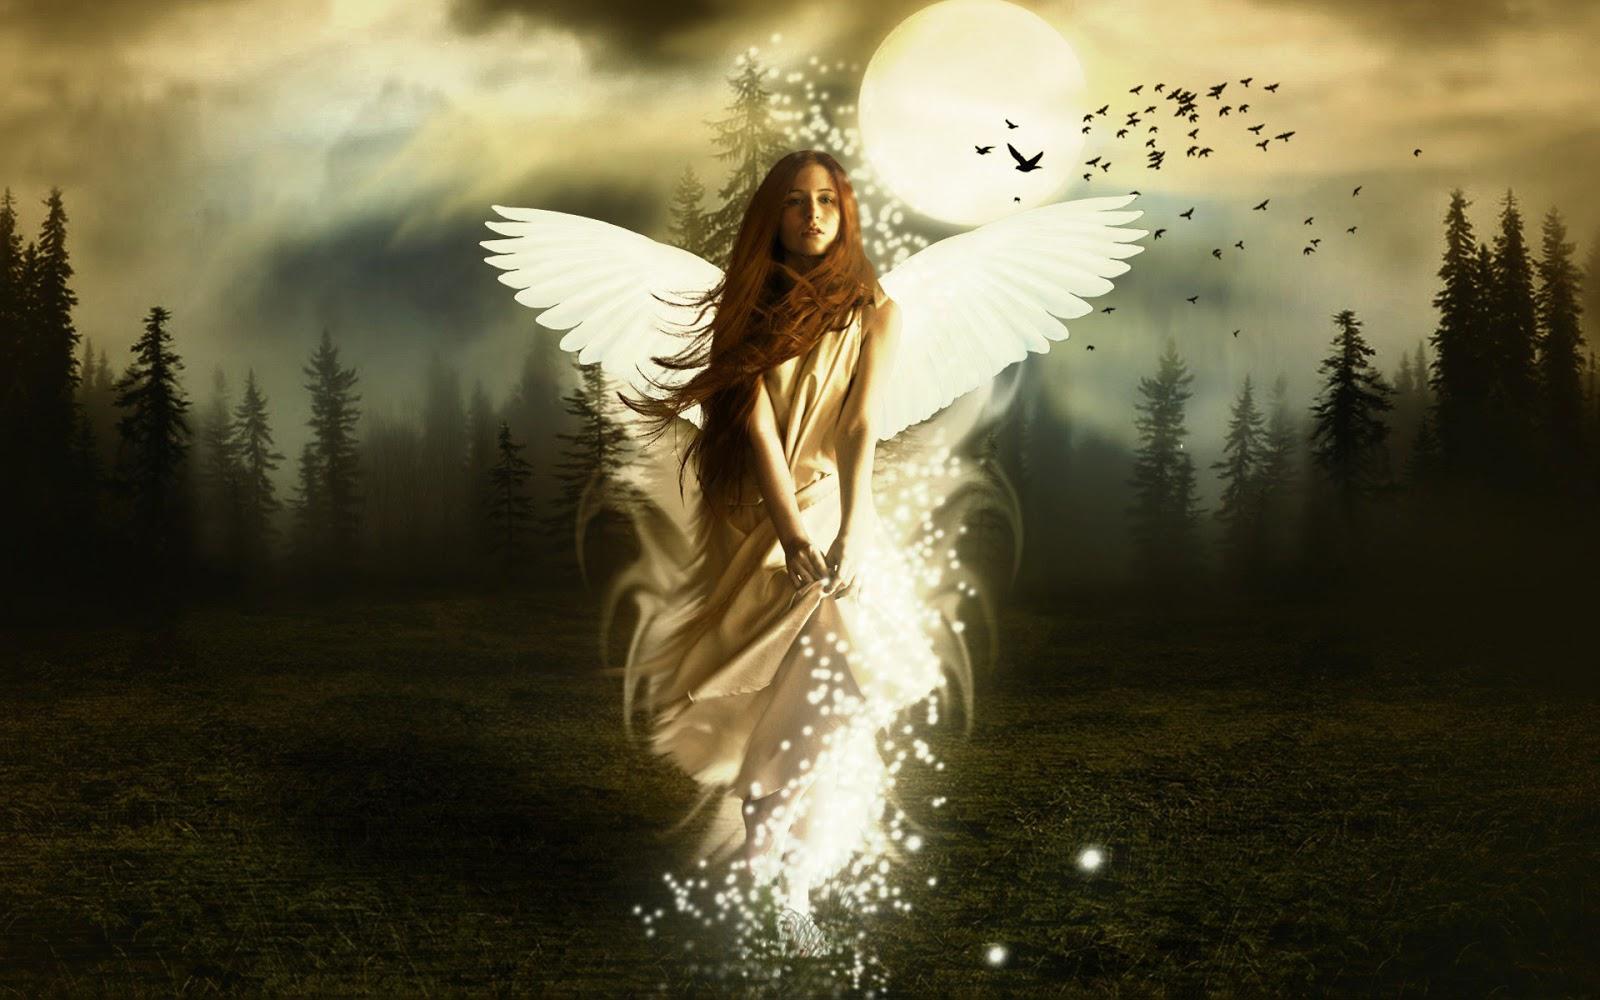 http://1.bp.blogspot.com/-MUwWTI_i1TA/UIvDBCar-CI/AAAAAAAAE70/KyKavFk6AmA/s1600/White+Angel+awesome+HD+image.jpg